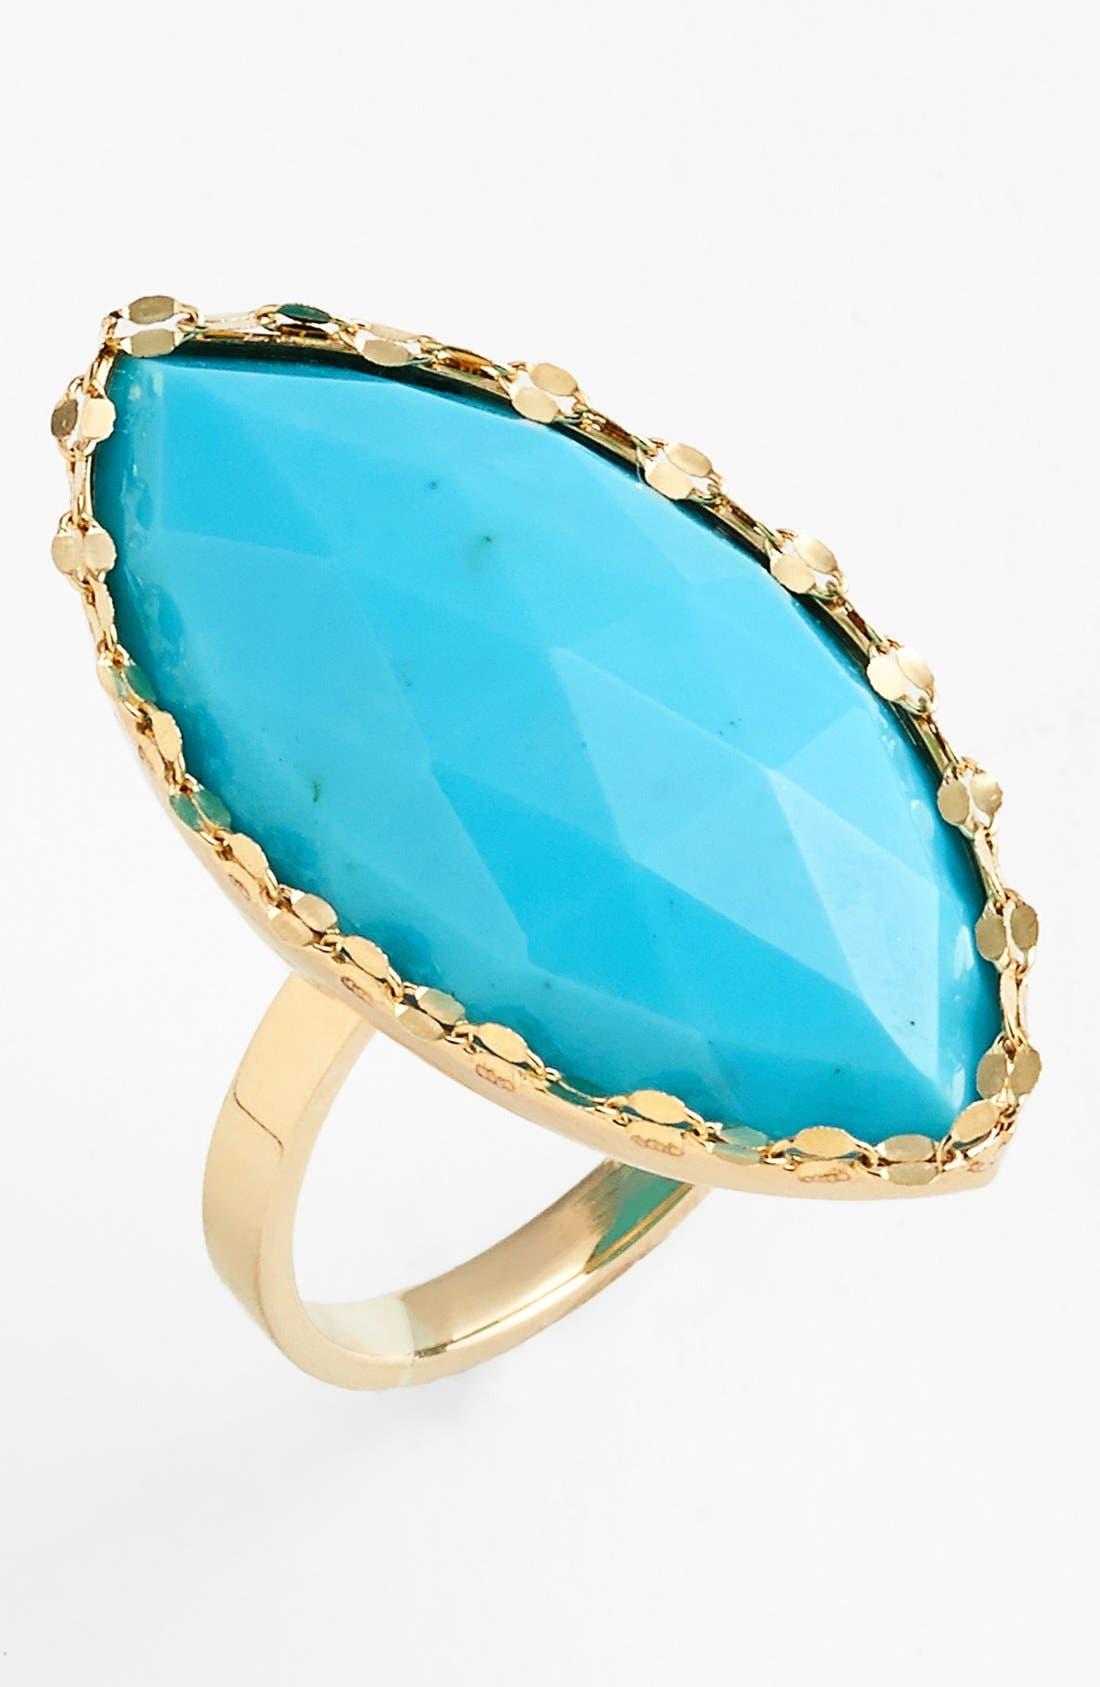 Main Image - Lana Jewelry Turquoise Marquise Ring